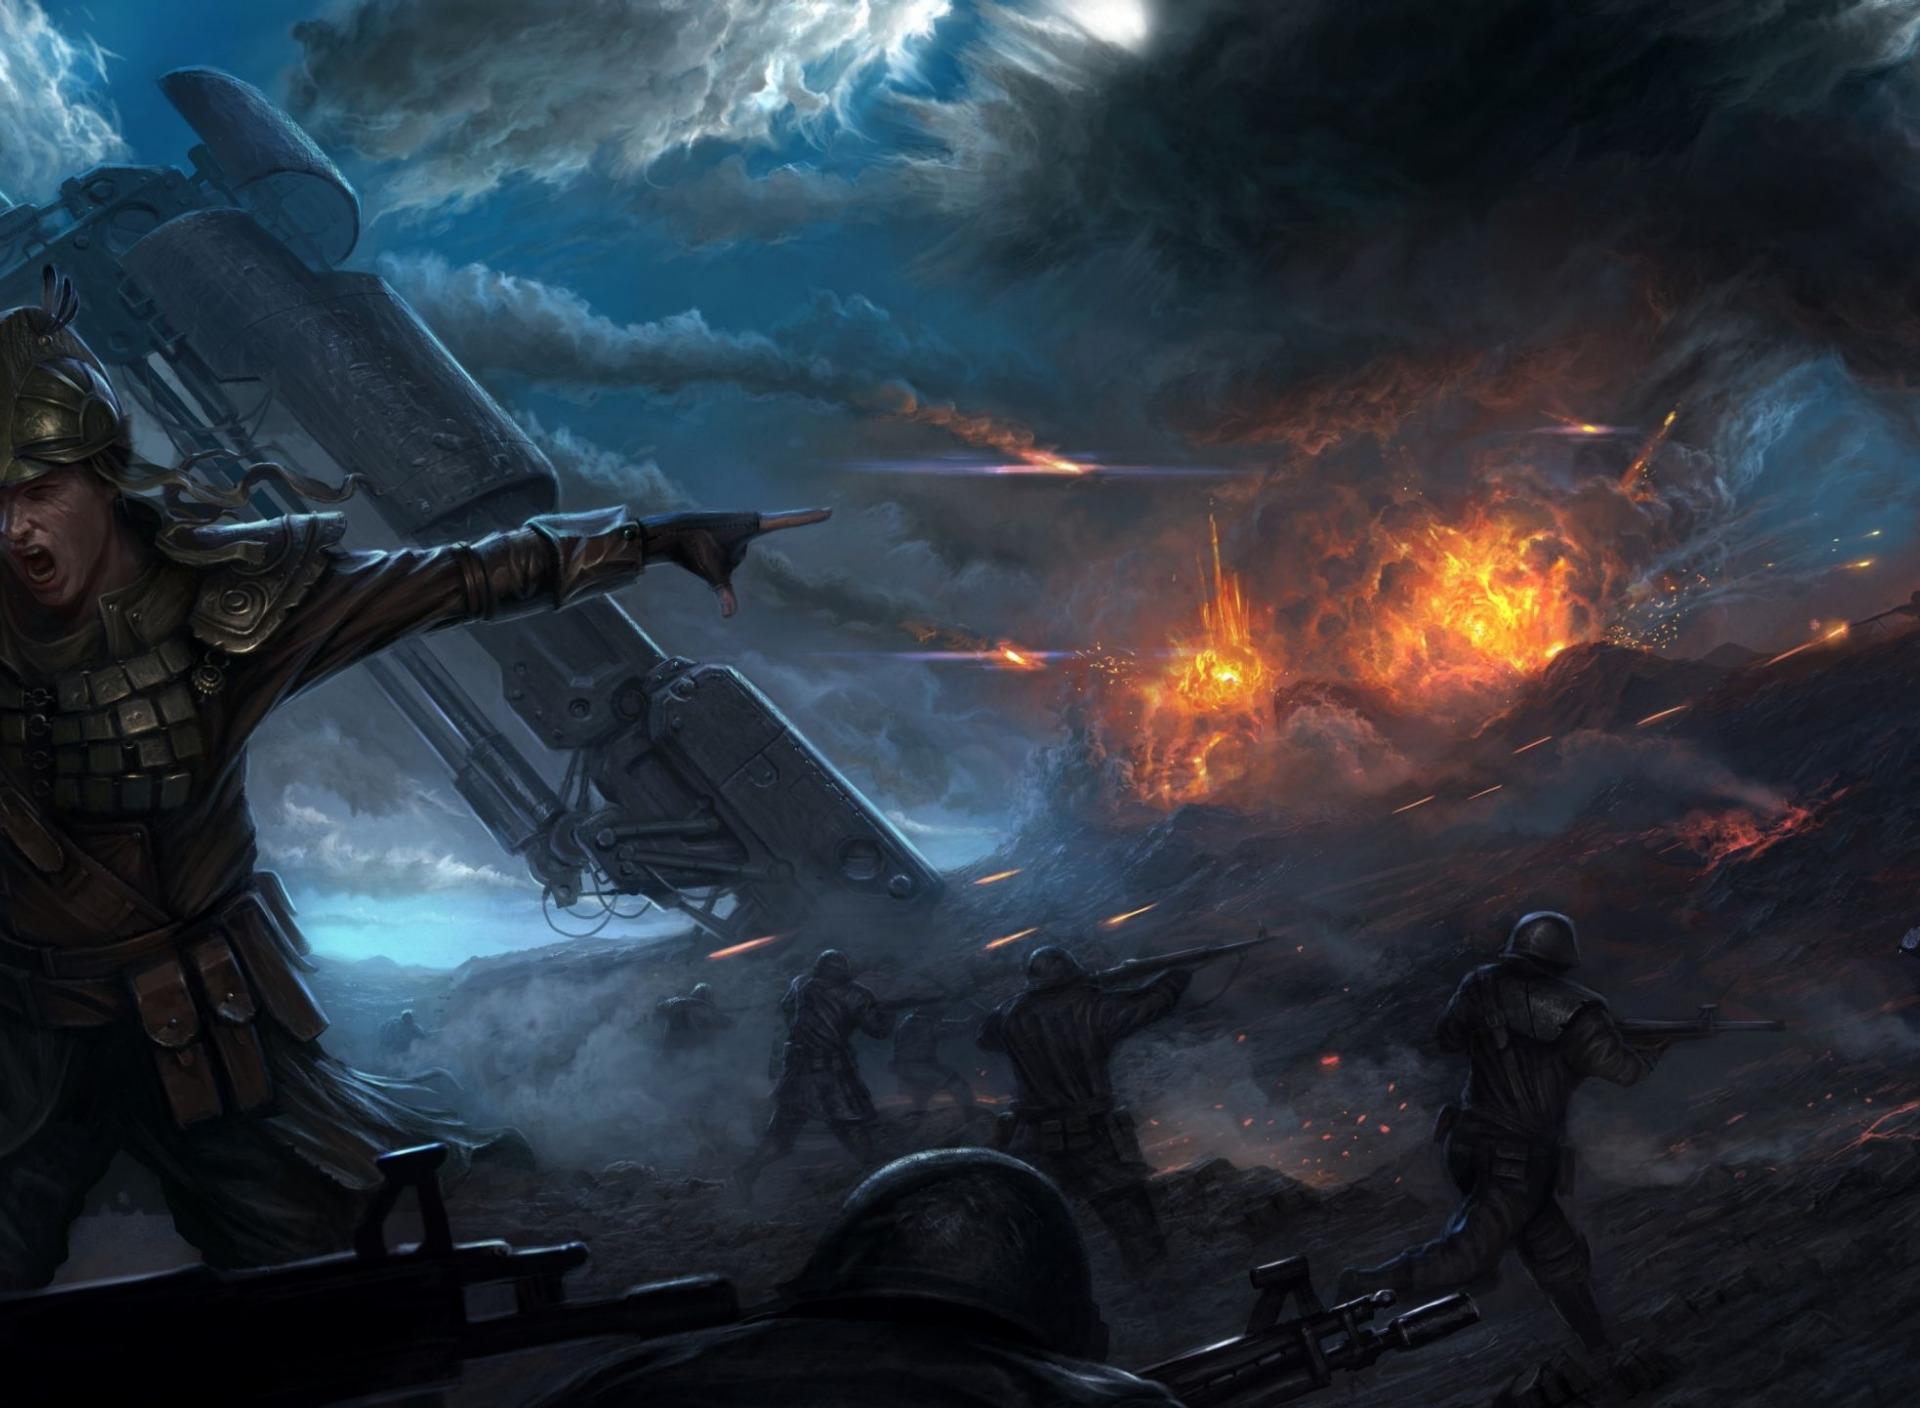 Картинки фантастических войн